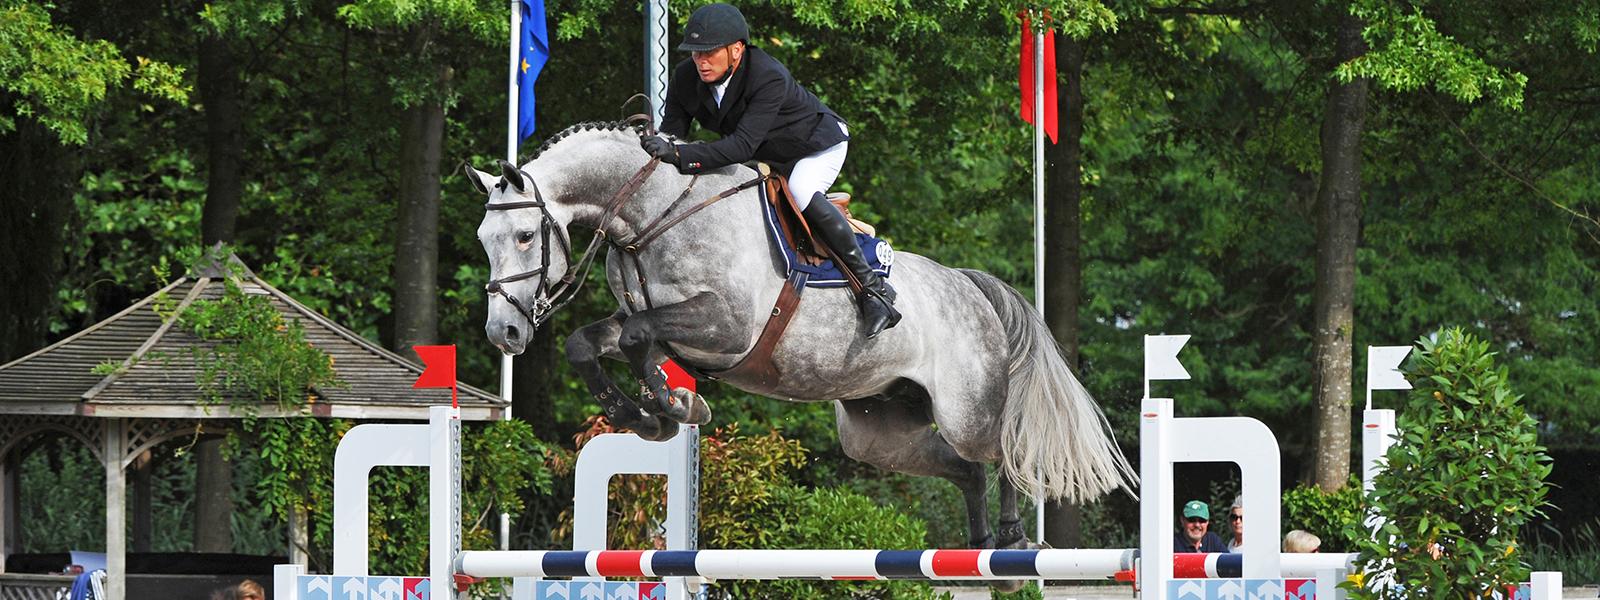 Jaguar van Paemel, showjumper stallion